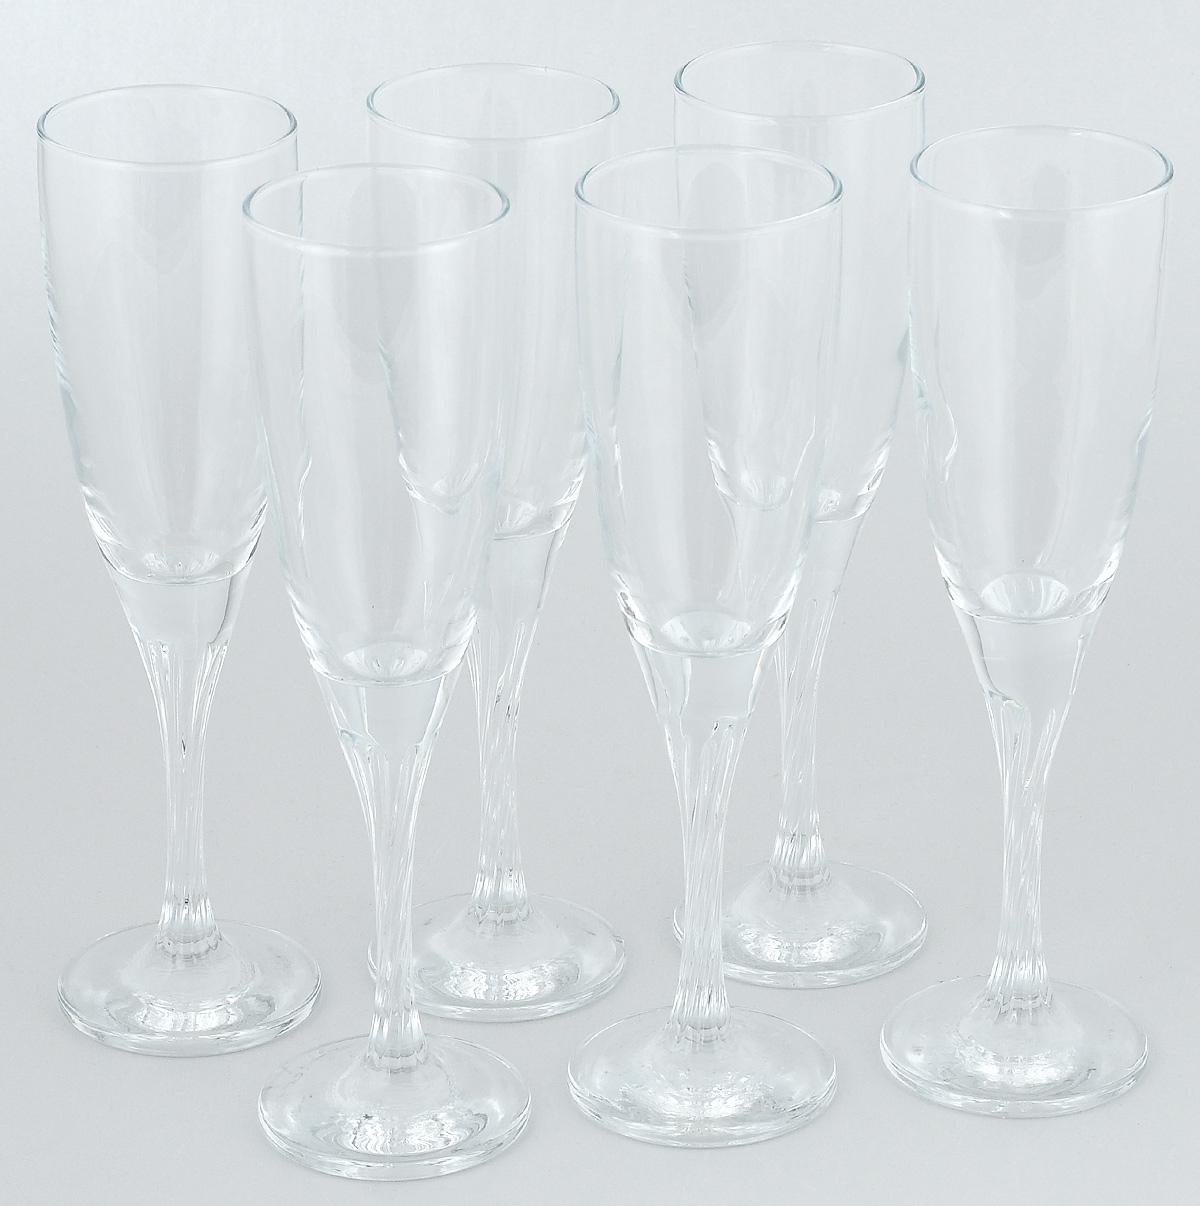 Набор бокалов Pasabahce Твист, 150 мл, 6 шт44307BНабор бокалов для шампанского 6 штV=150 мл